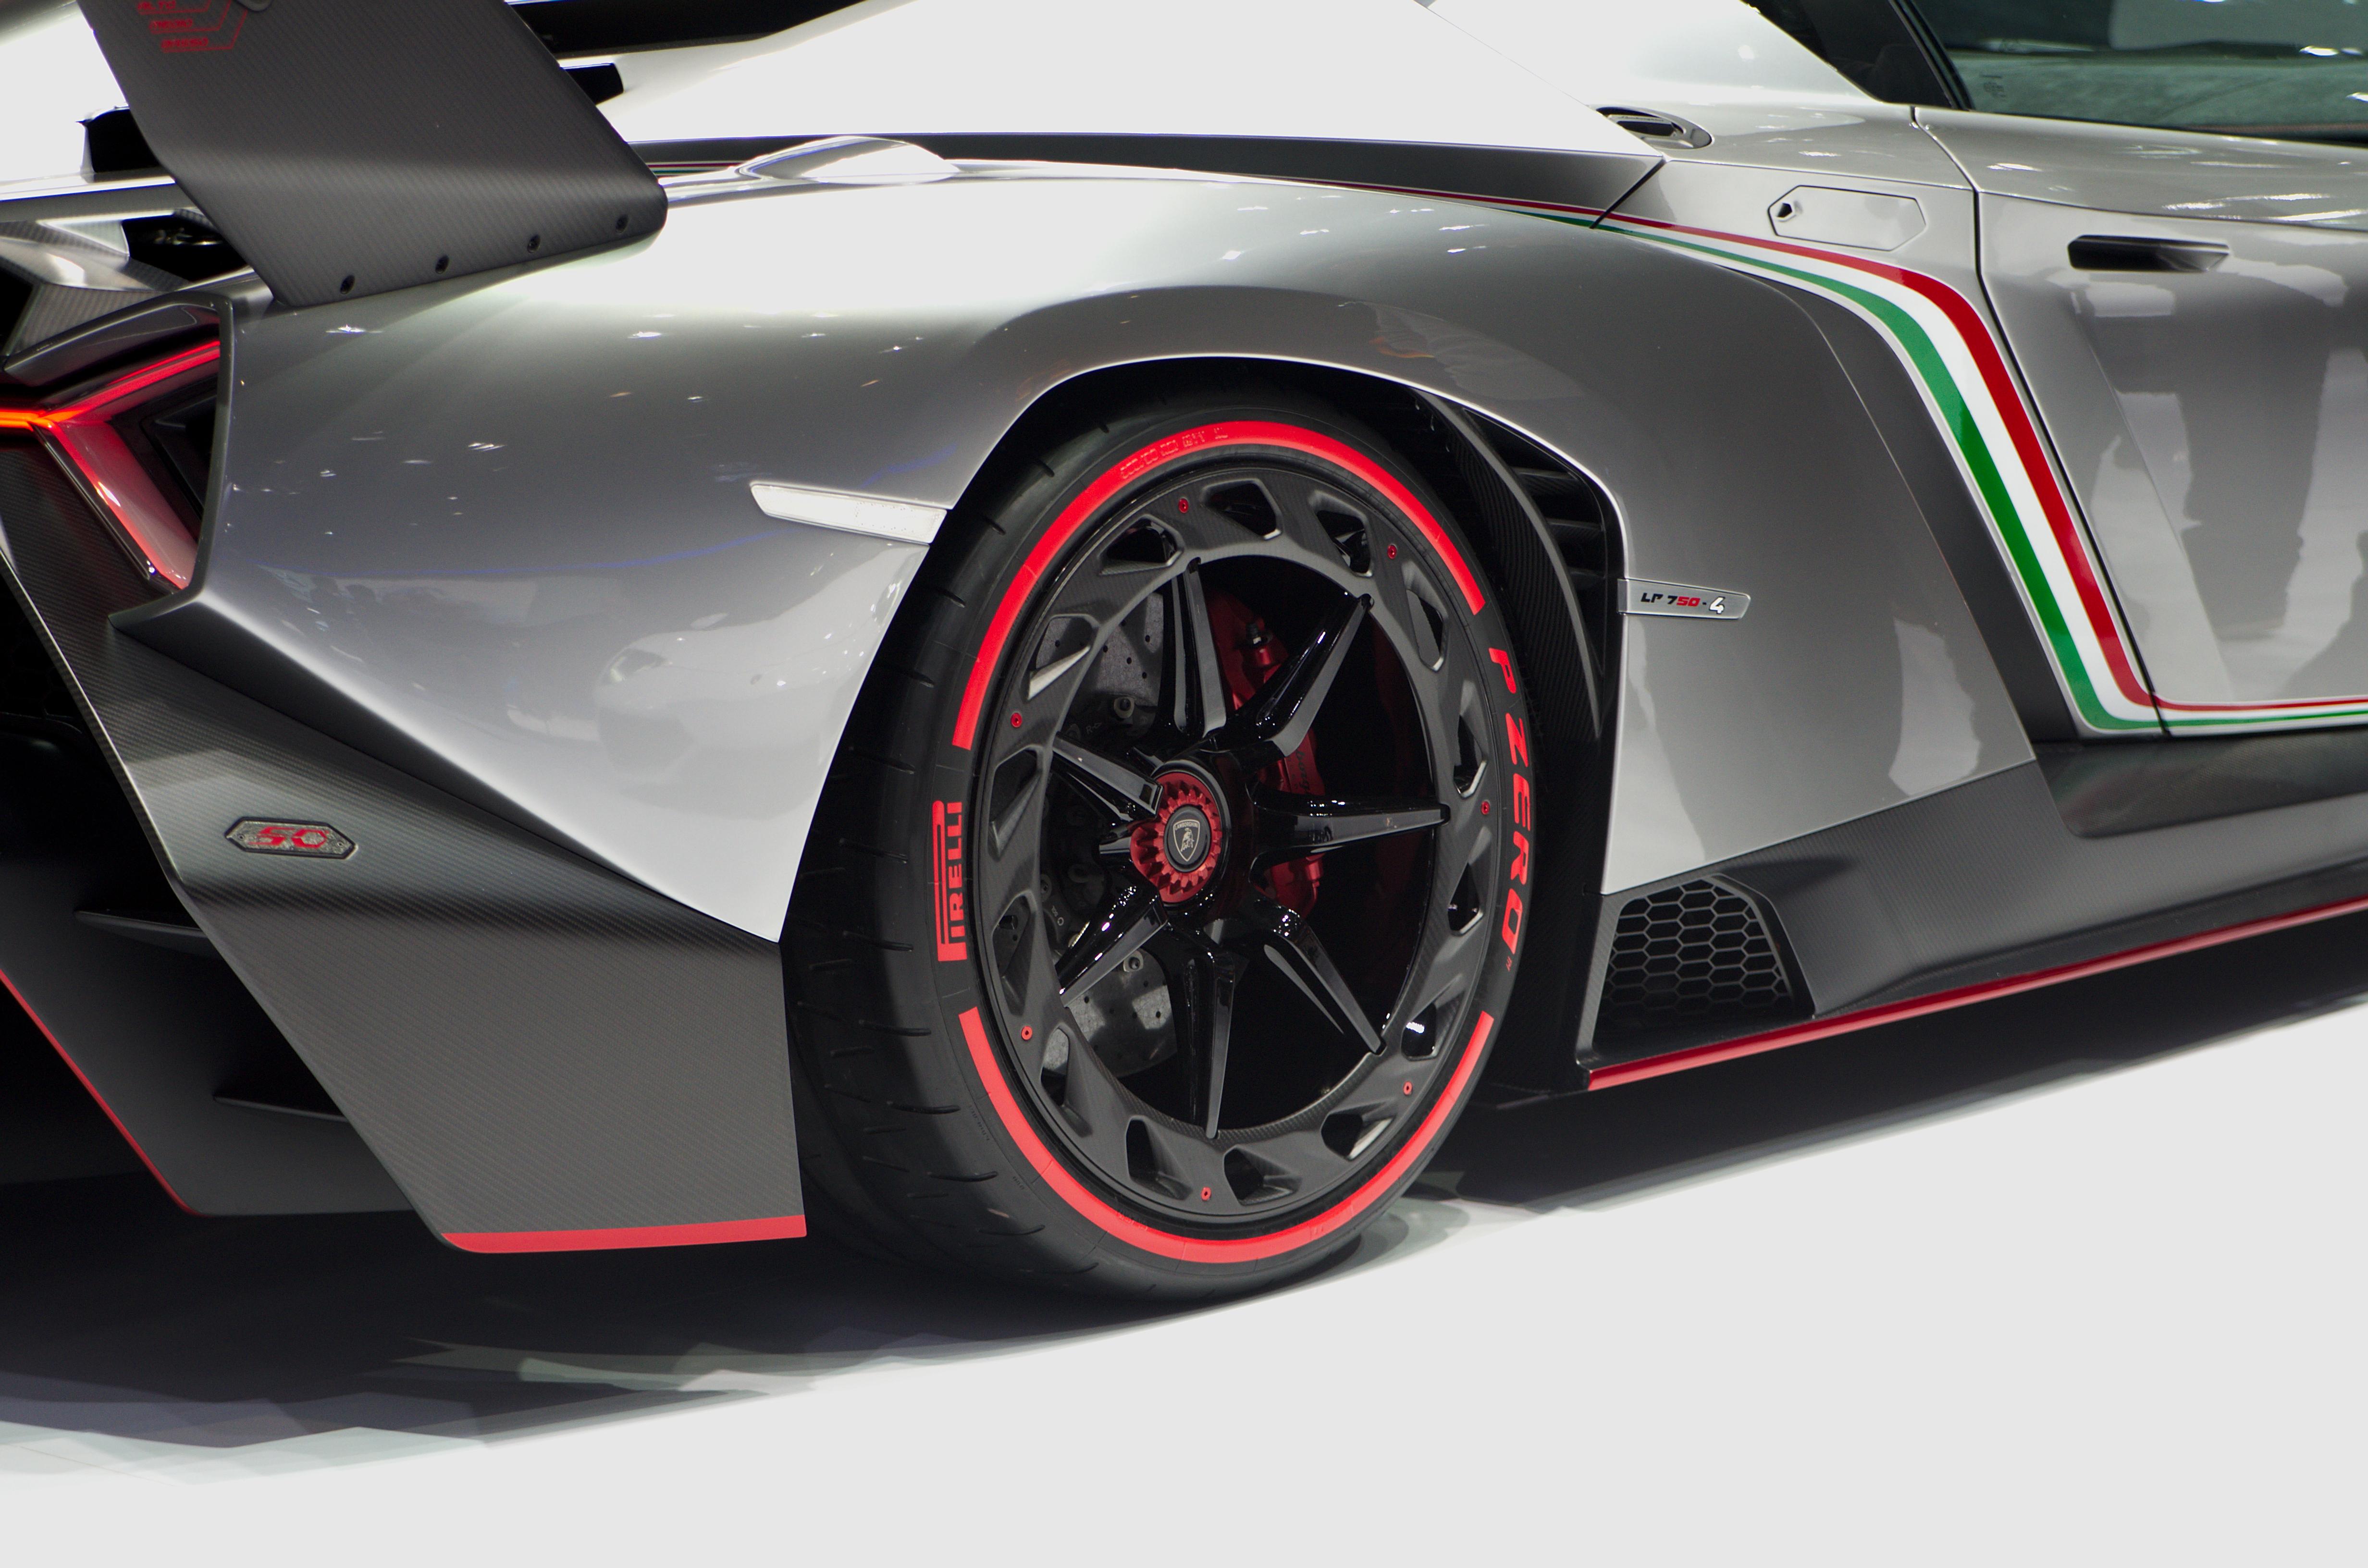 Lamborghini Veneno Wiki >> File:Geneva MotorShow 2013 - Lamborghini Veneno rear wheel.jpg